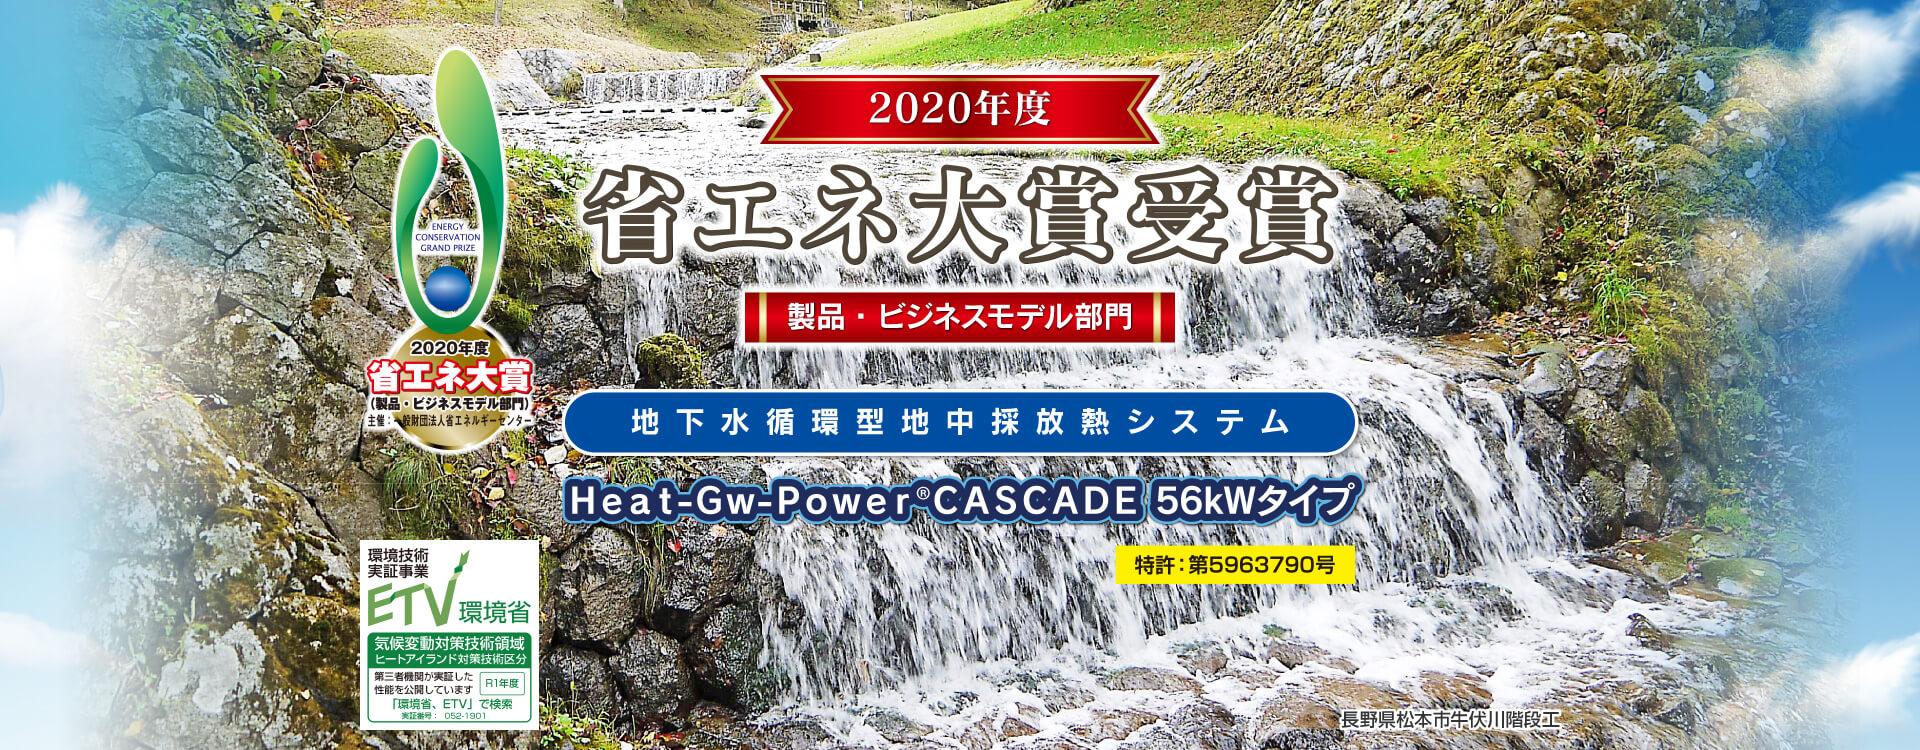 地下水循環型地中採放熱システム/Heat-Gw-Power CASCADE